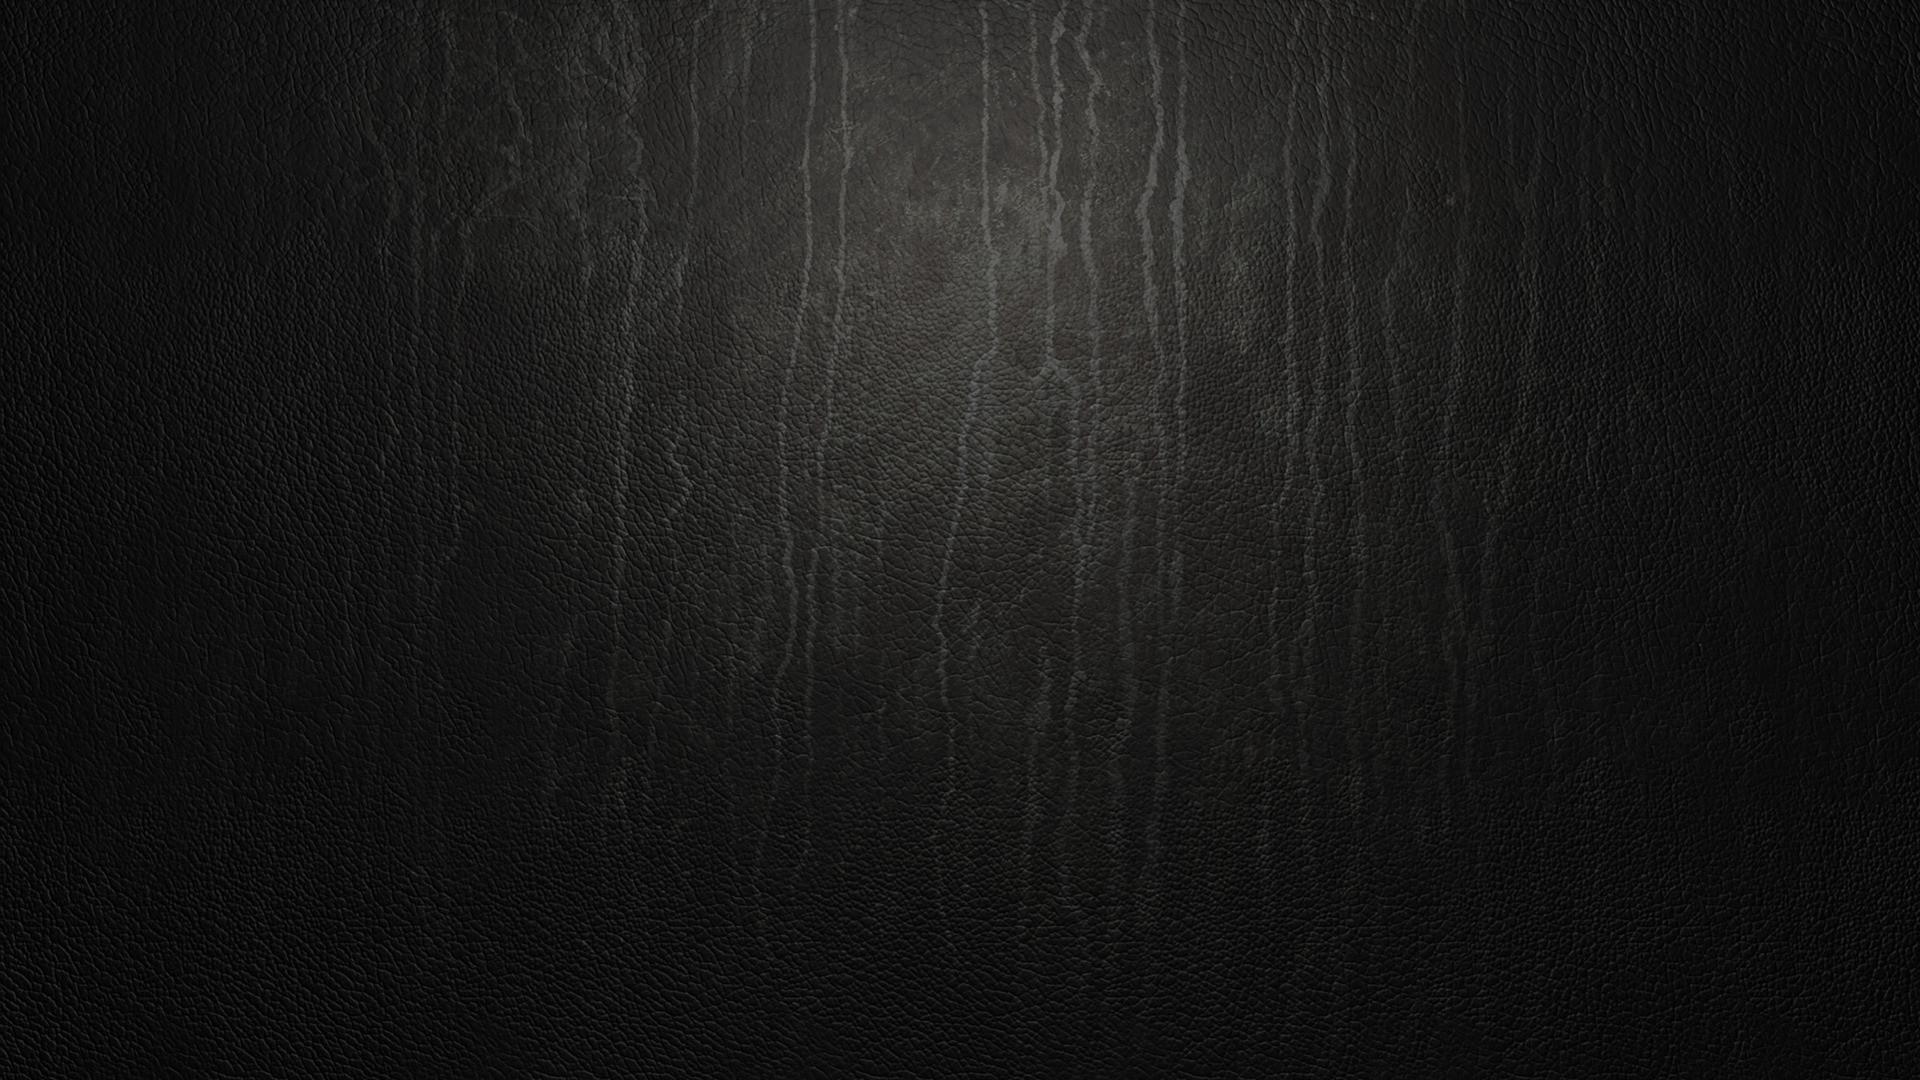 Black Hd Wallpaper 9 Desktop Wallpaper